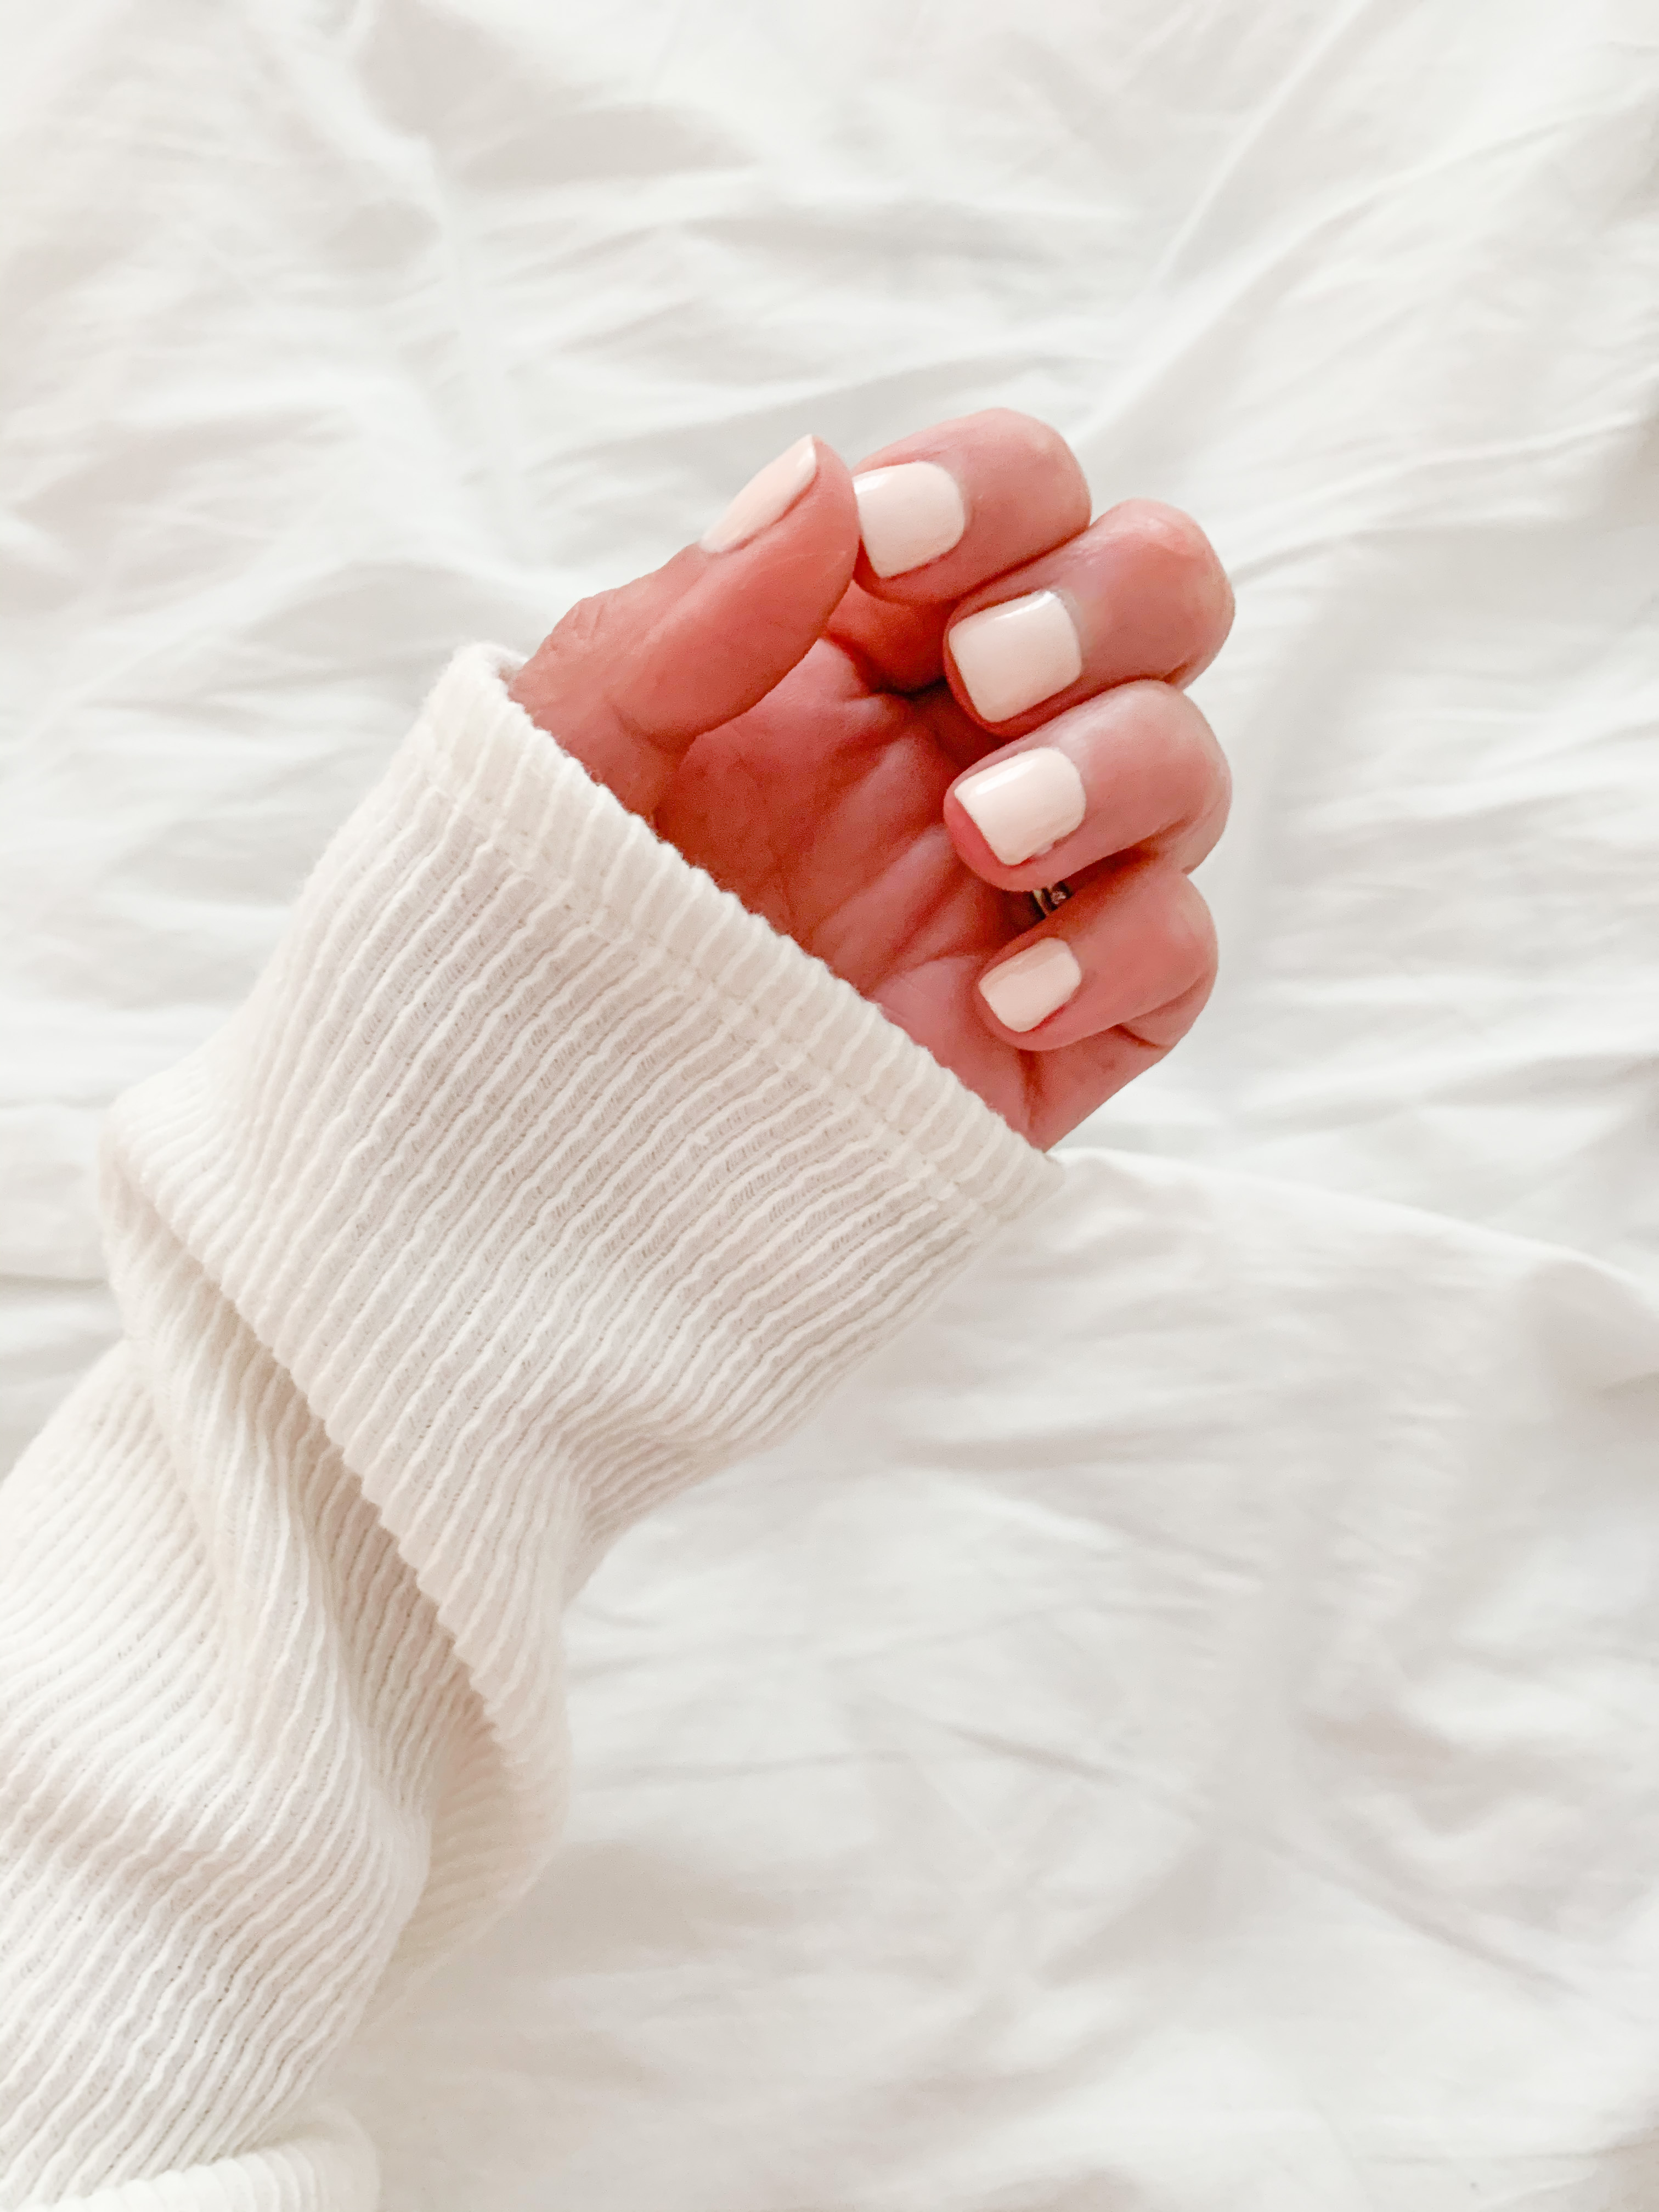 non-toxic nail polish the modern day girlfriend